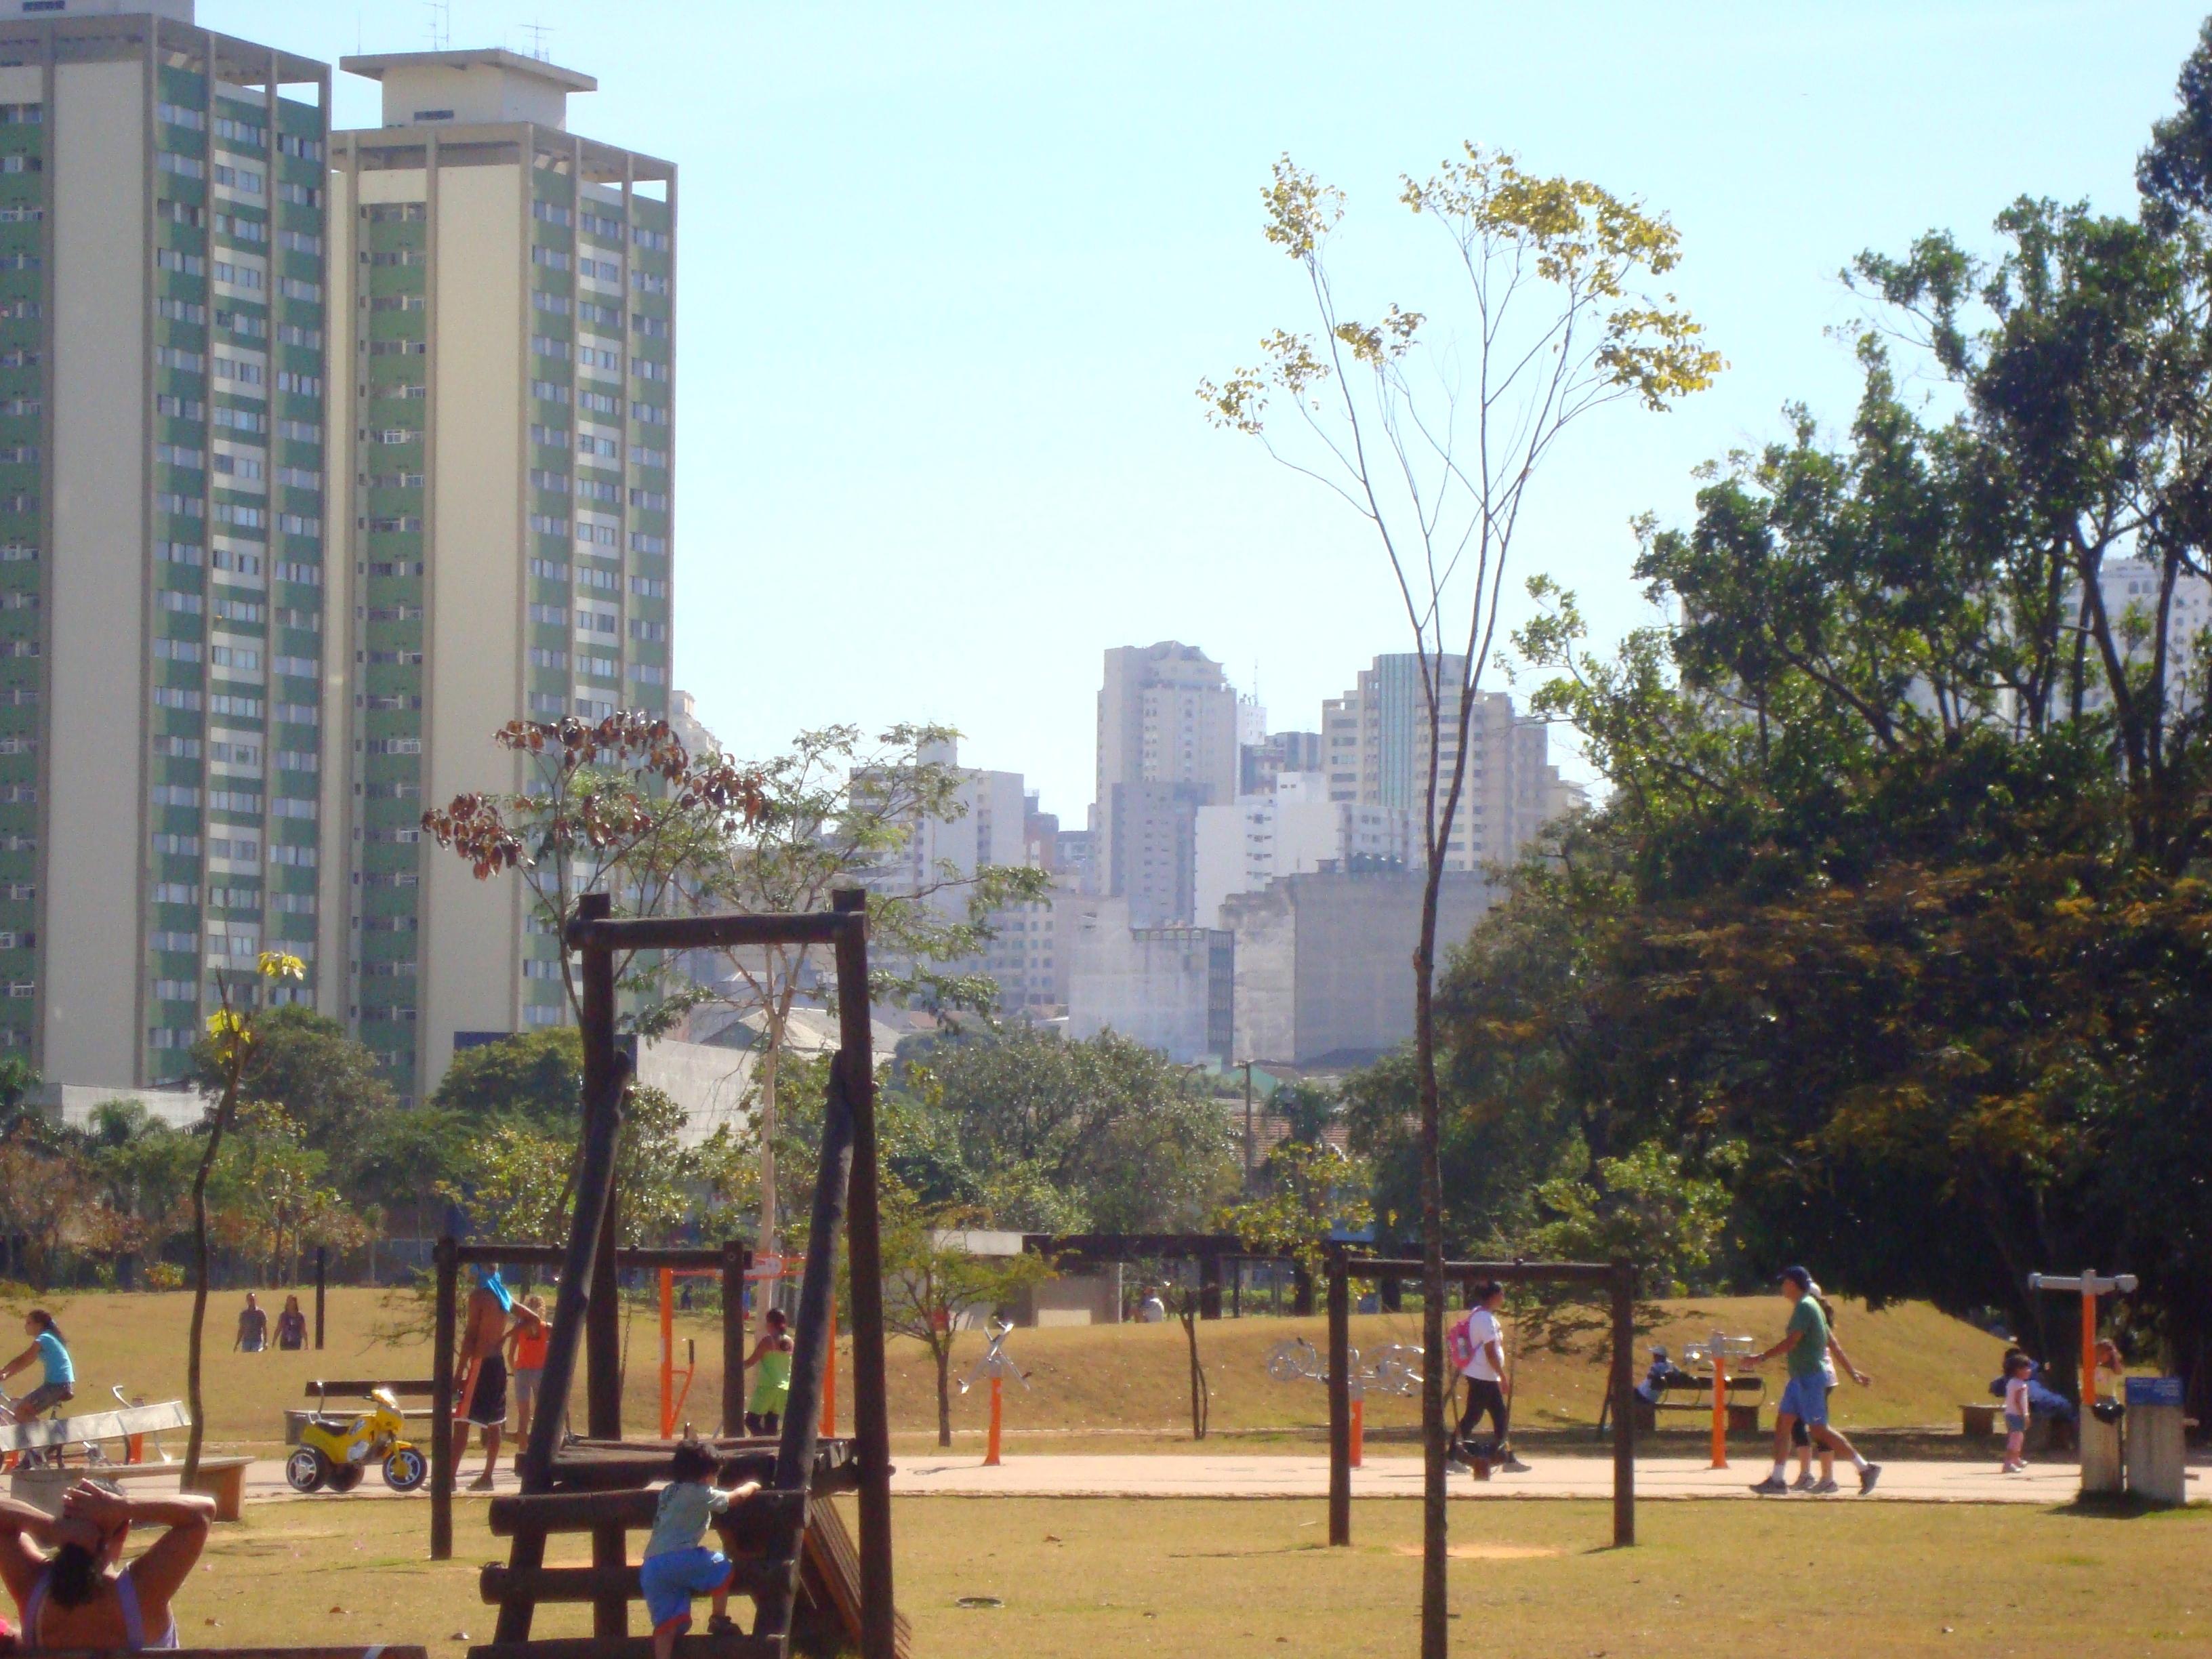 Parque_da_Juventude_e_Santana.JPG